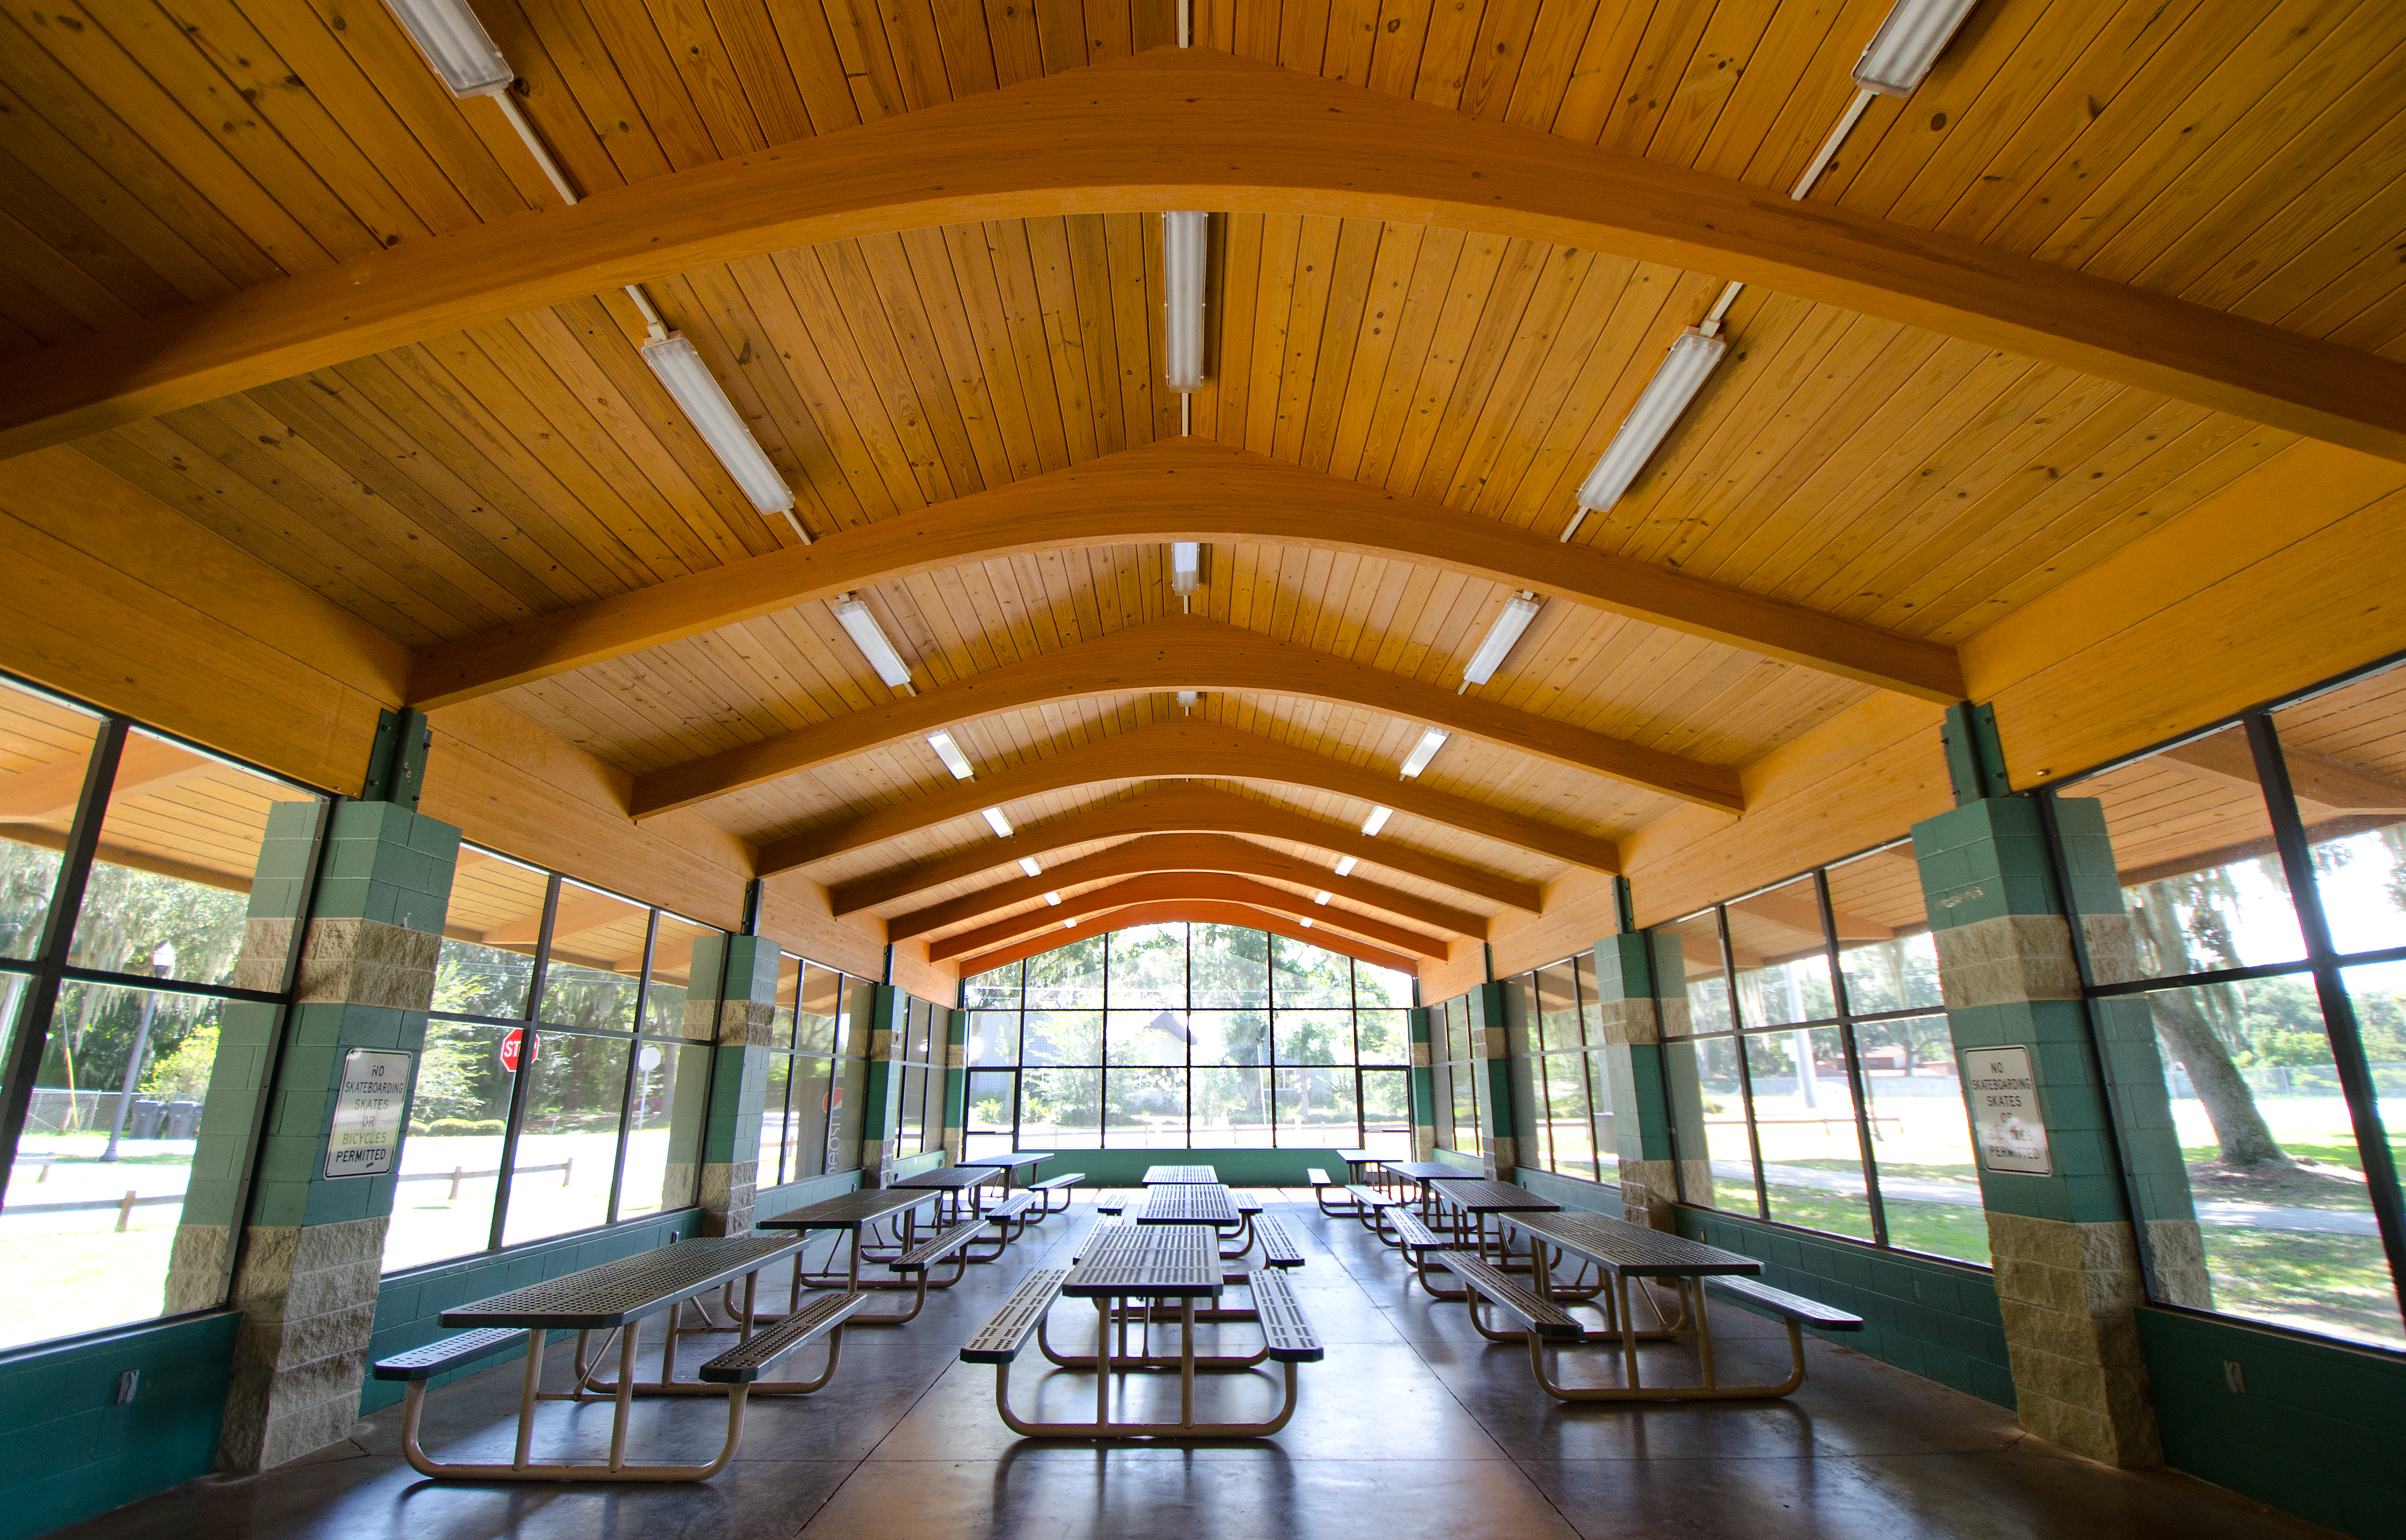 Christina Park Pavilion inside